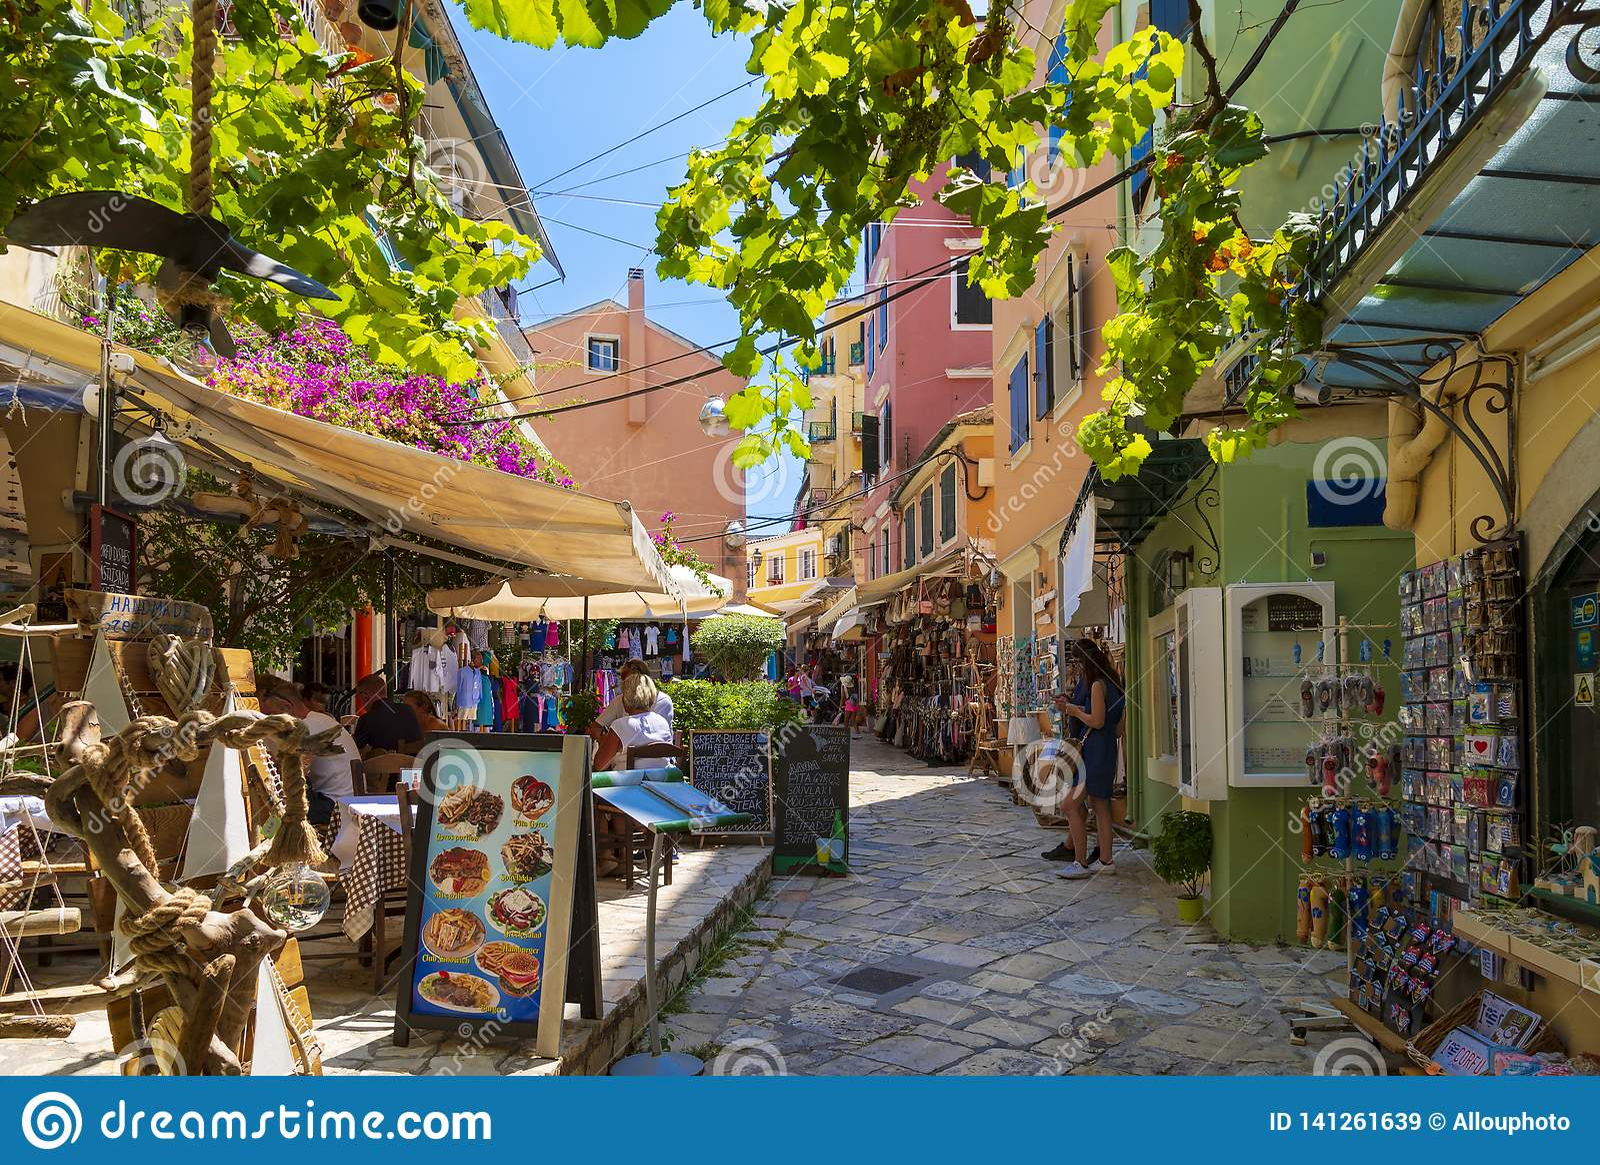 Corfu Town Centre Esplanades And Market Editorial Stock Image ...